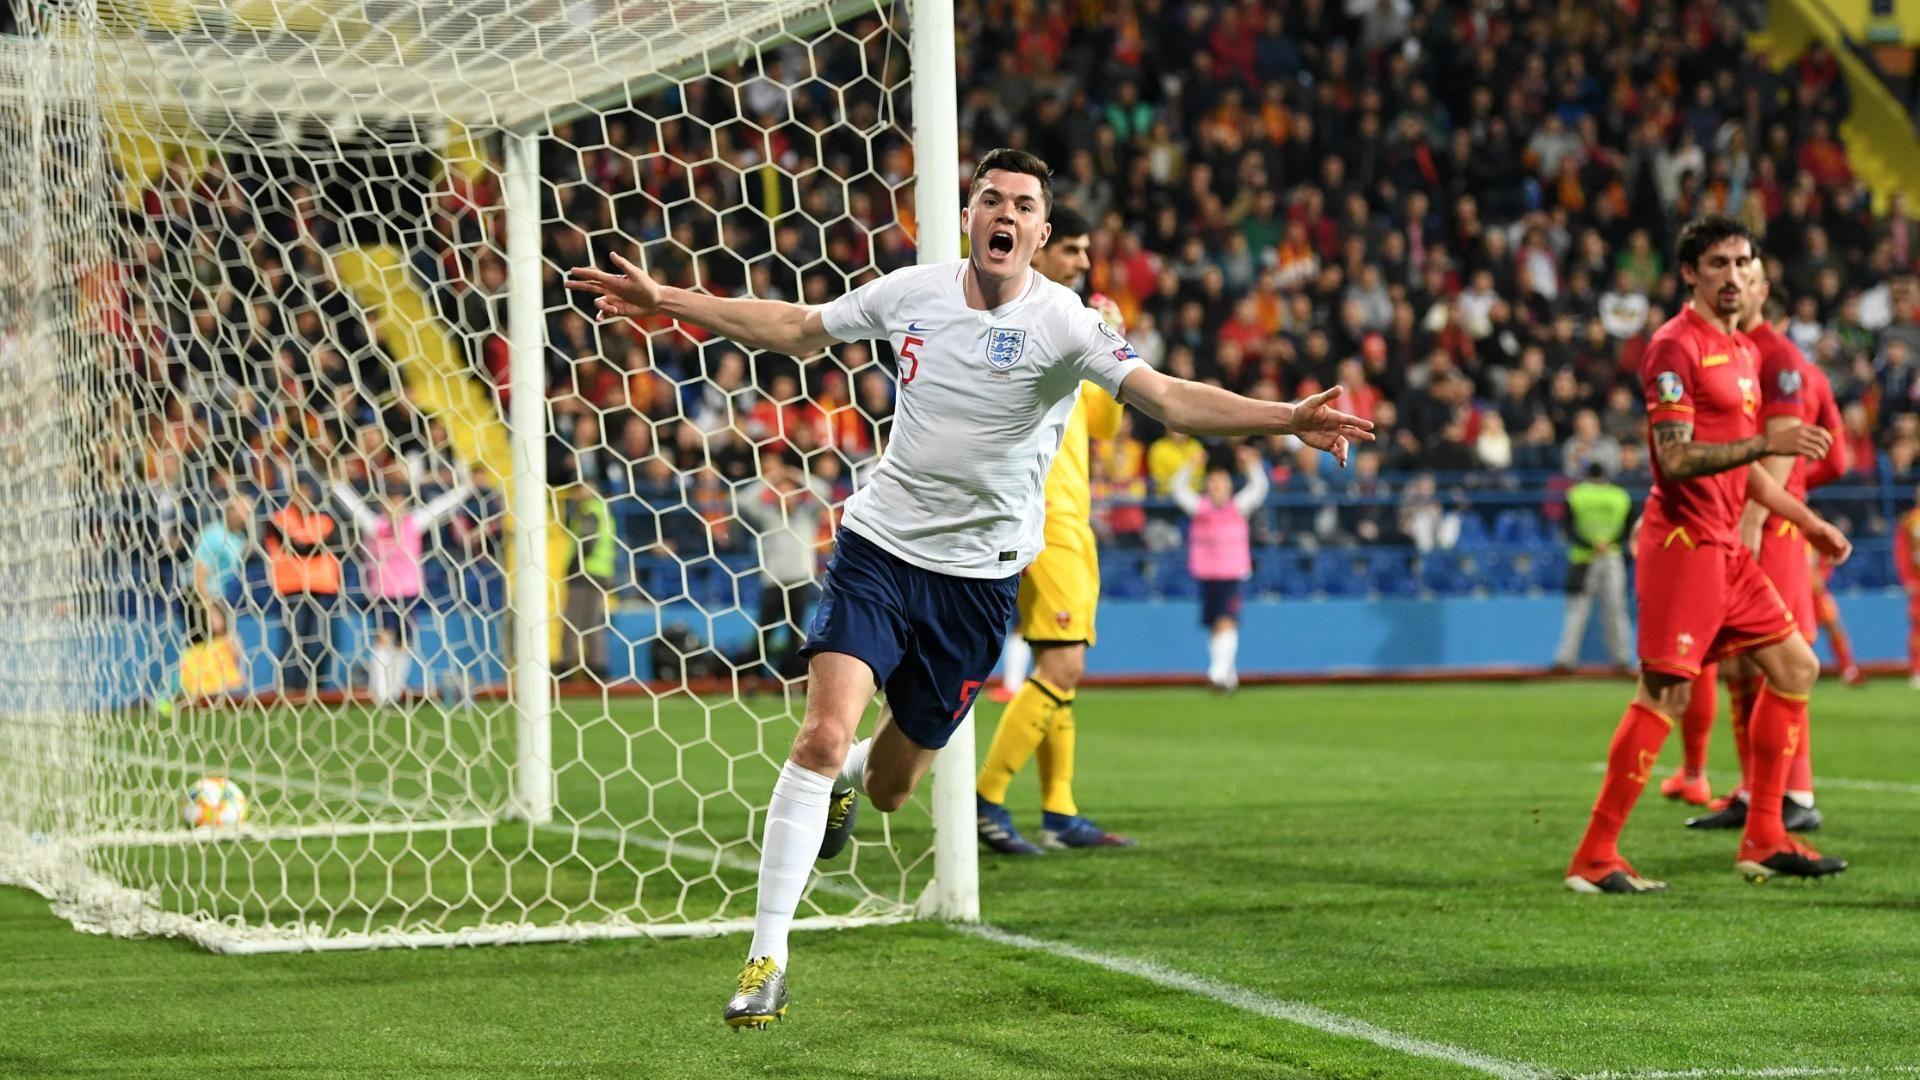 ¡GOL DE INGLATERRA! Keane puso el 1-1 ante Montenegro